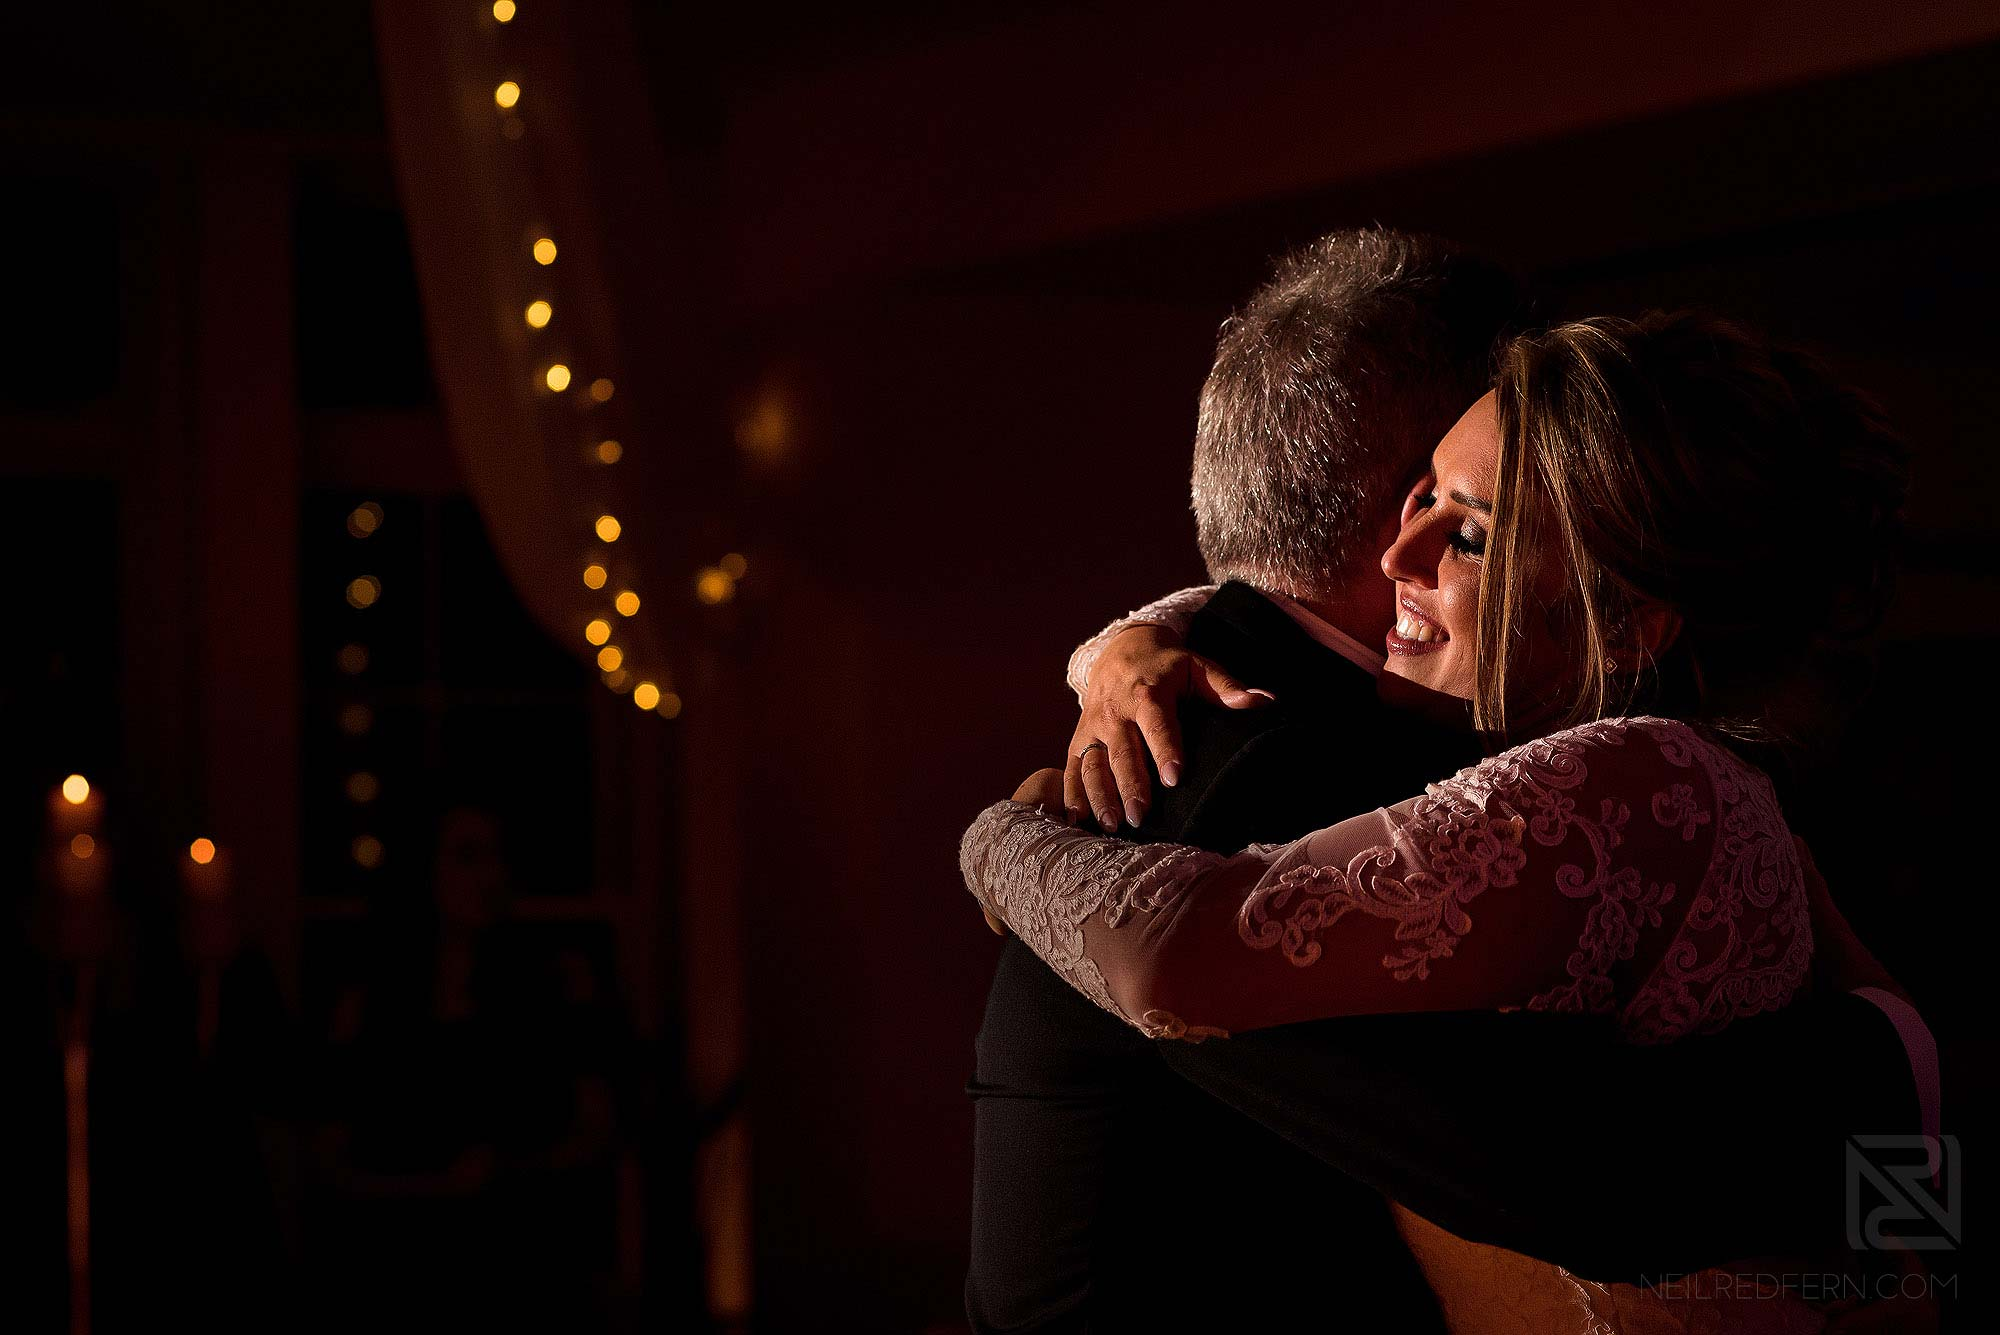 bride hugging dad on the dancefloor at wedding